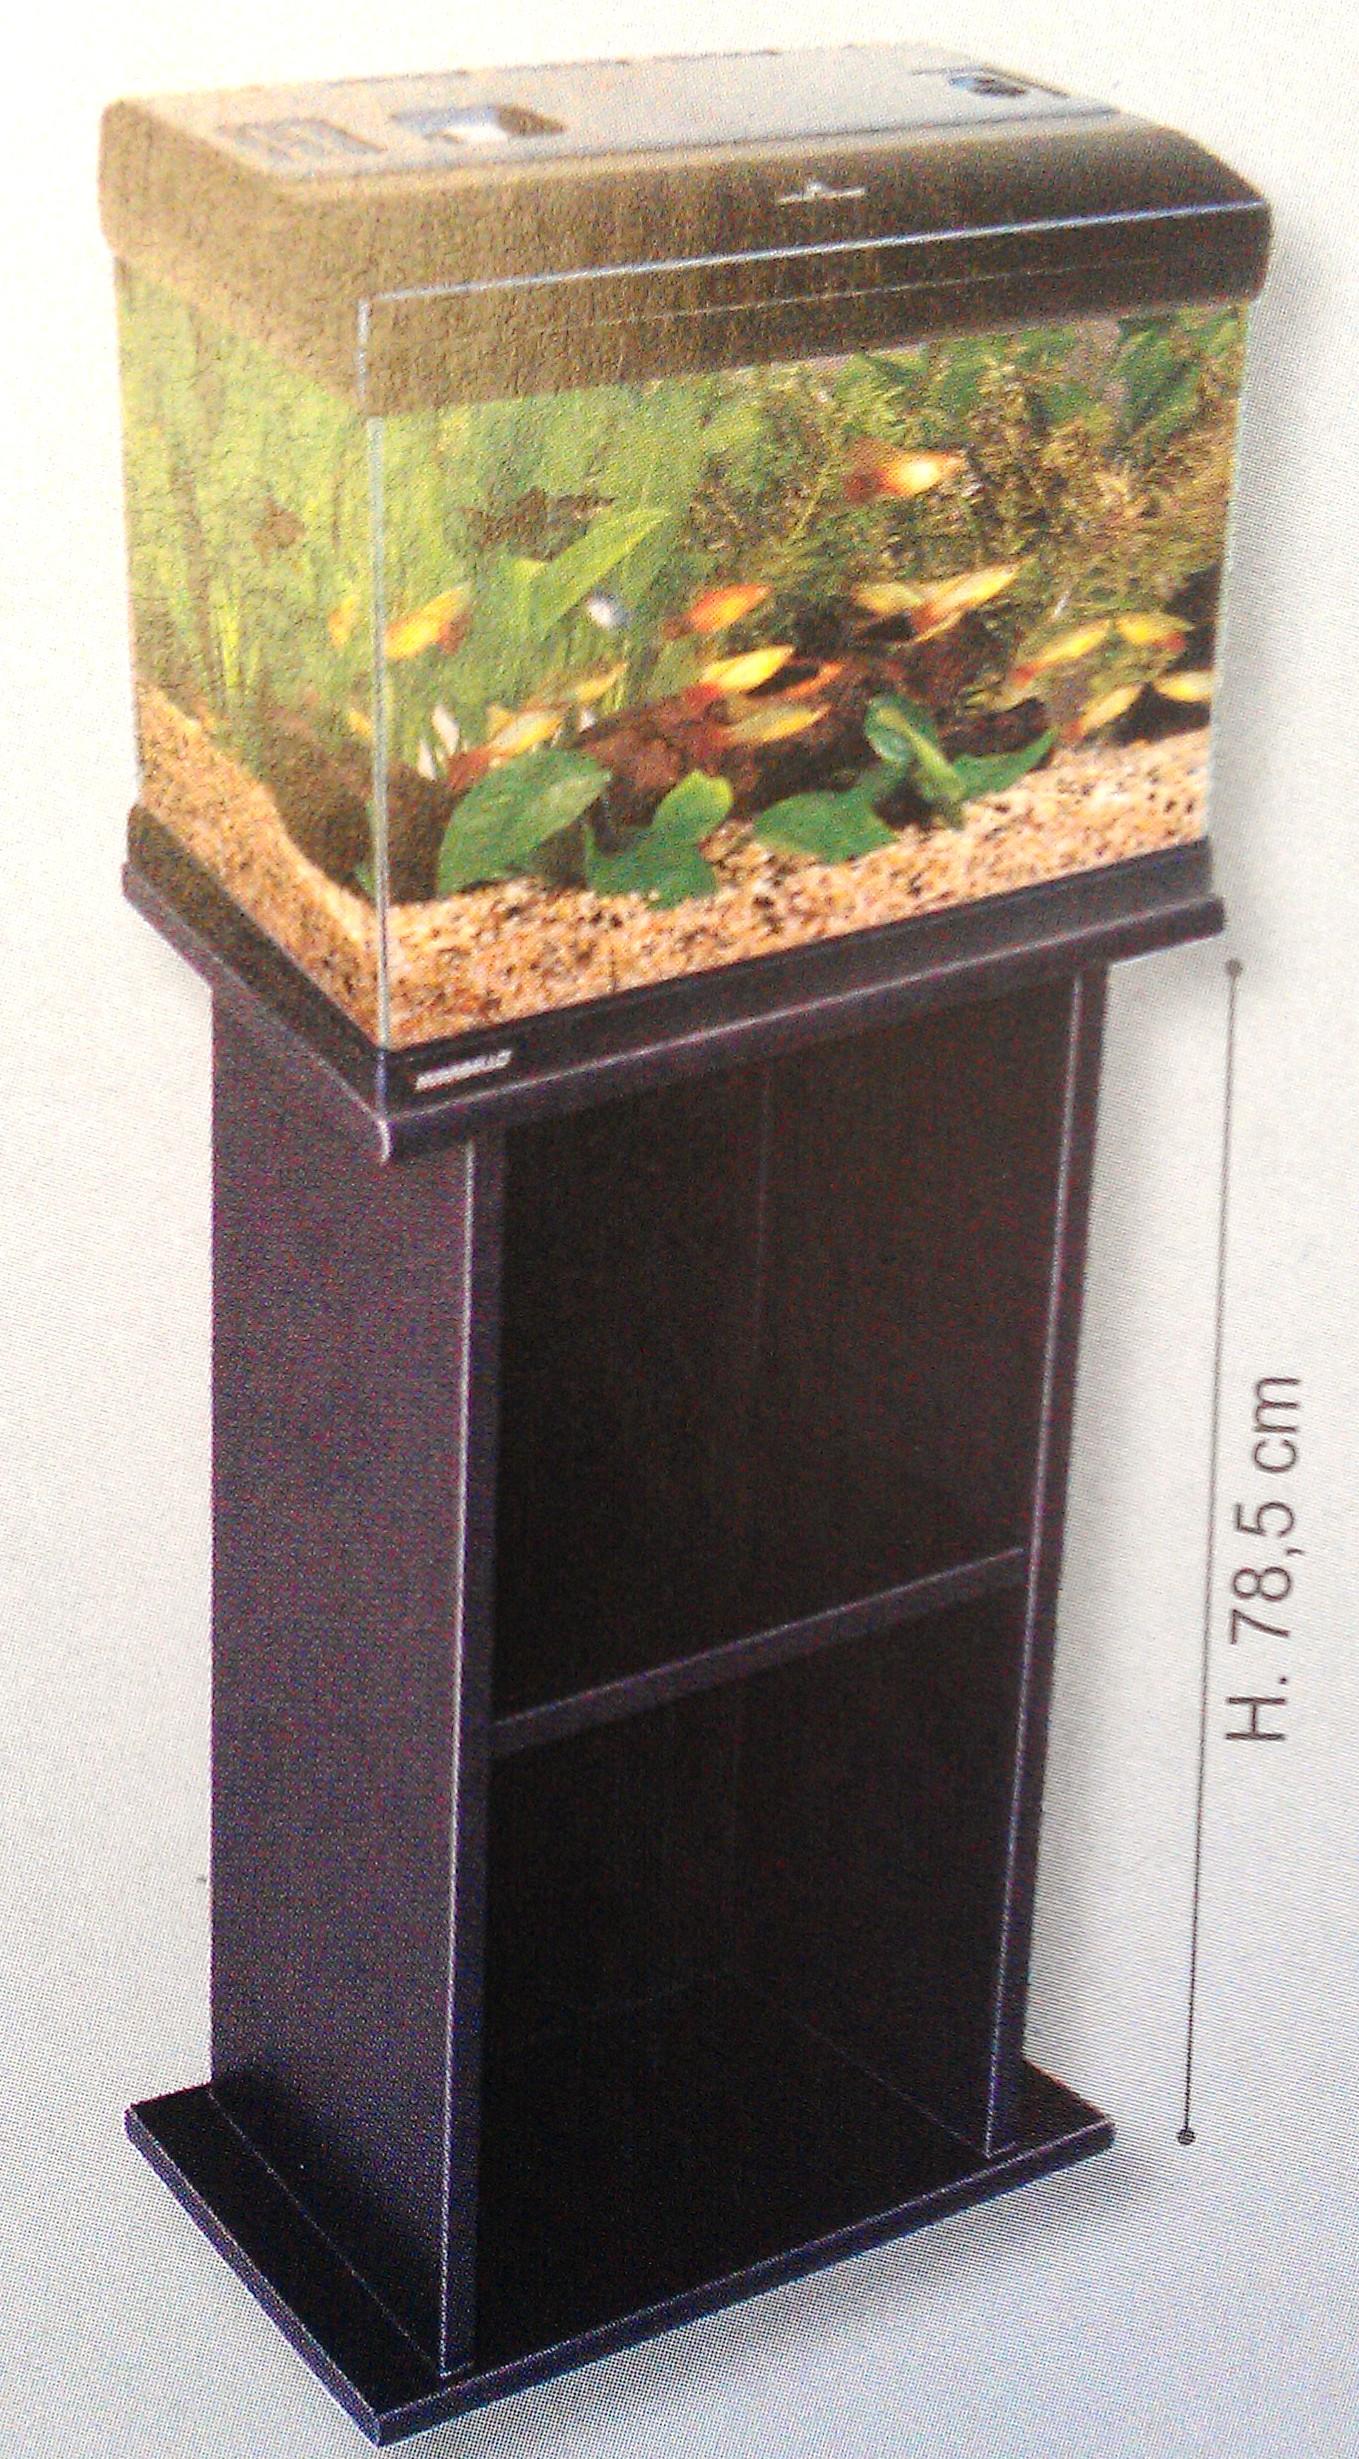 aquarium systems Подставка под аквариум Mirabello 30 0058004